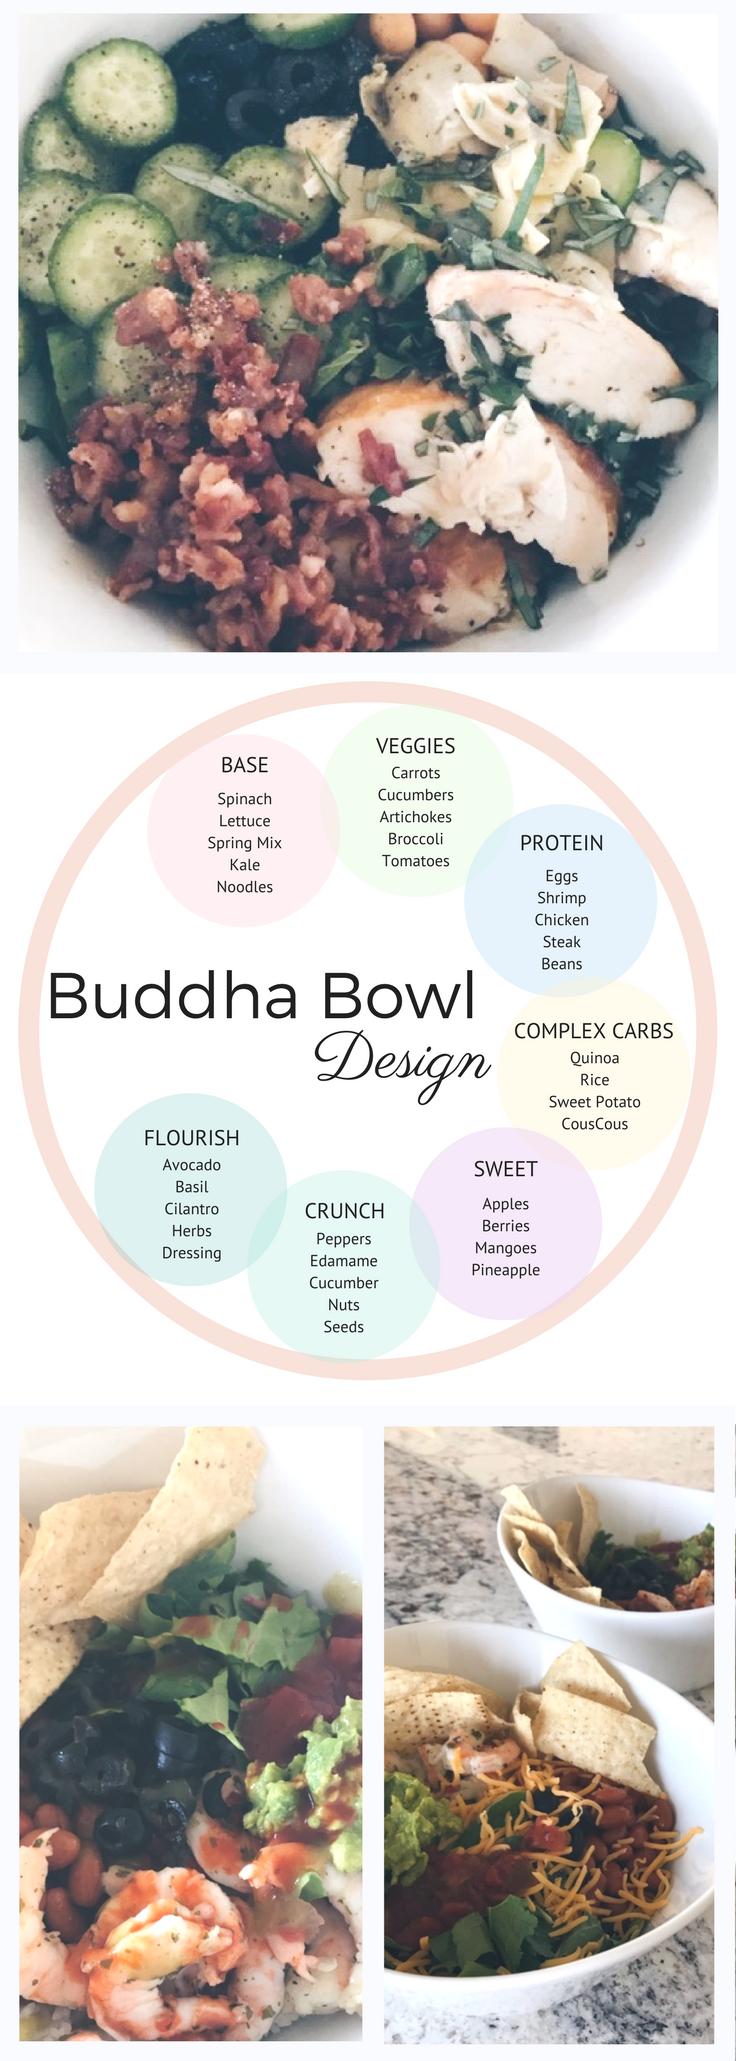 Buddha Bowl Pinterest.png